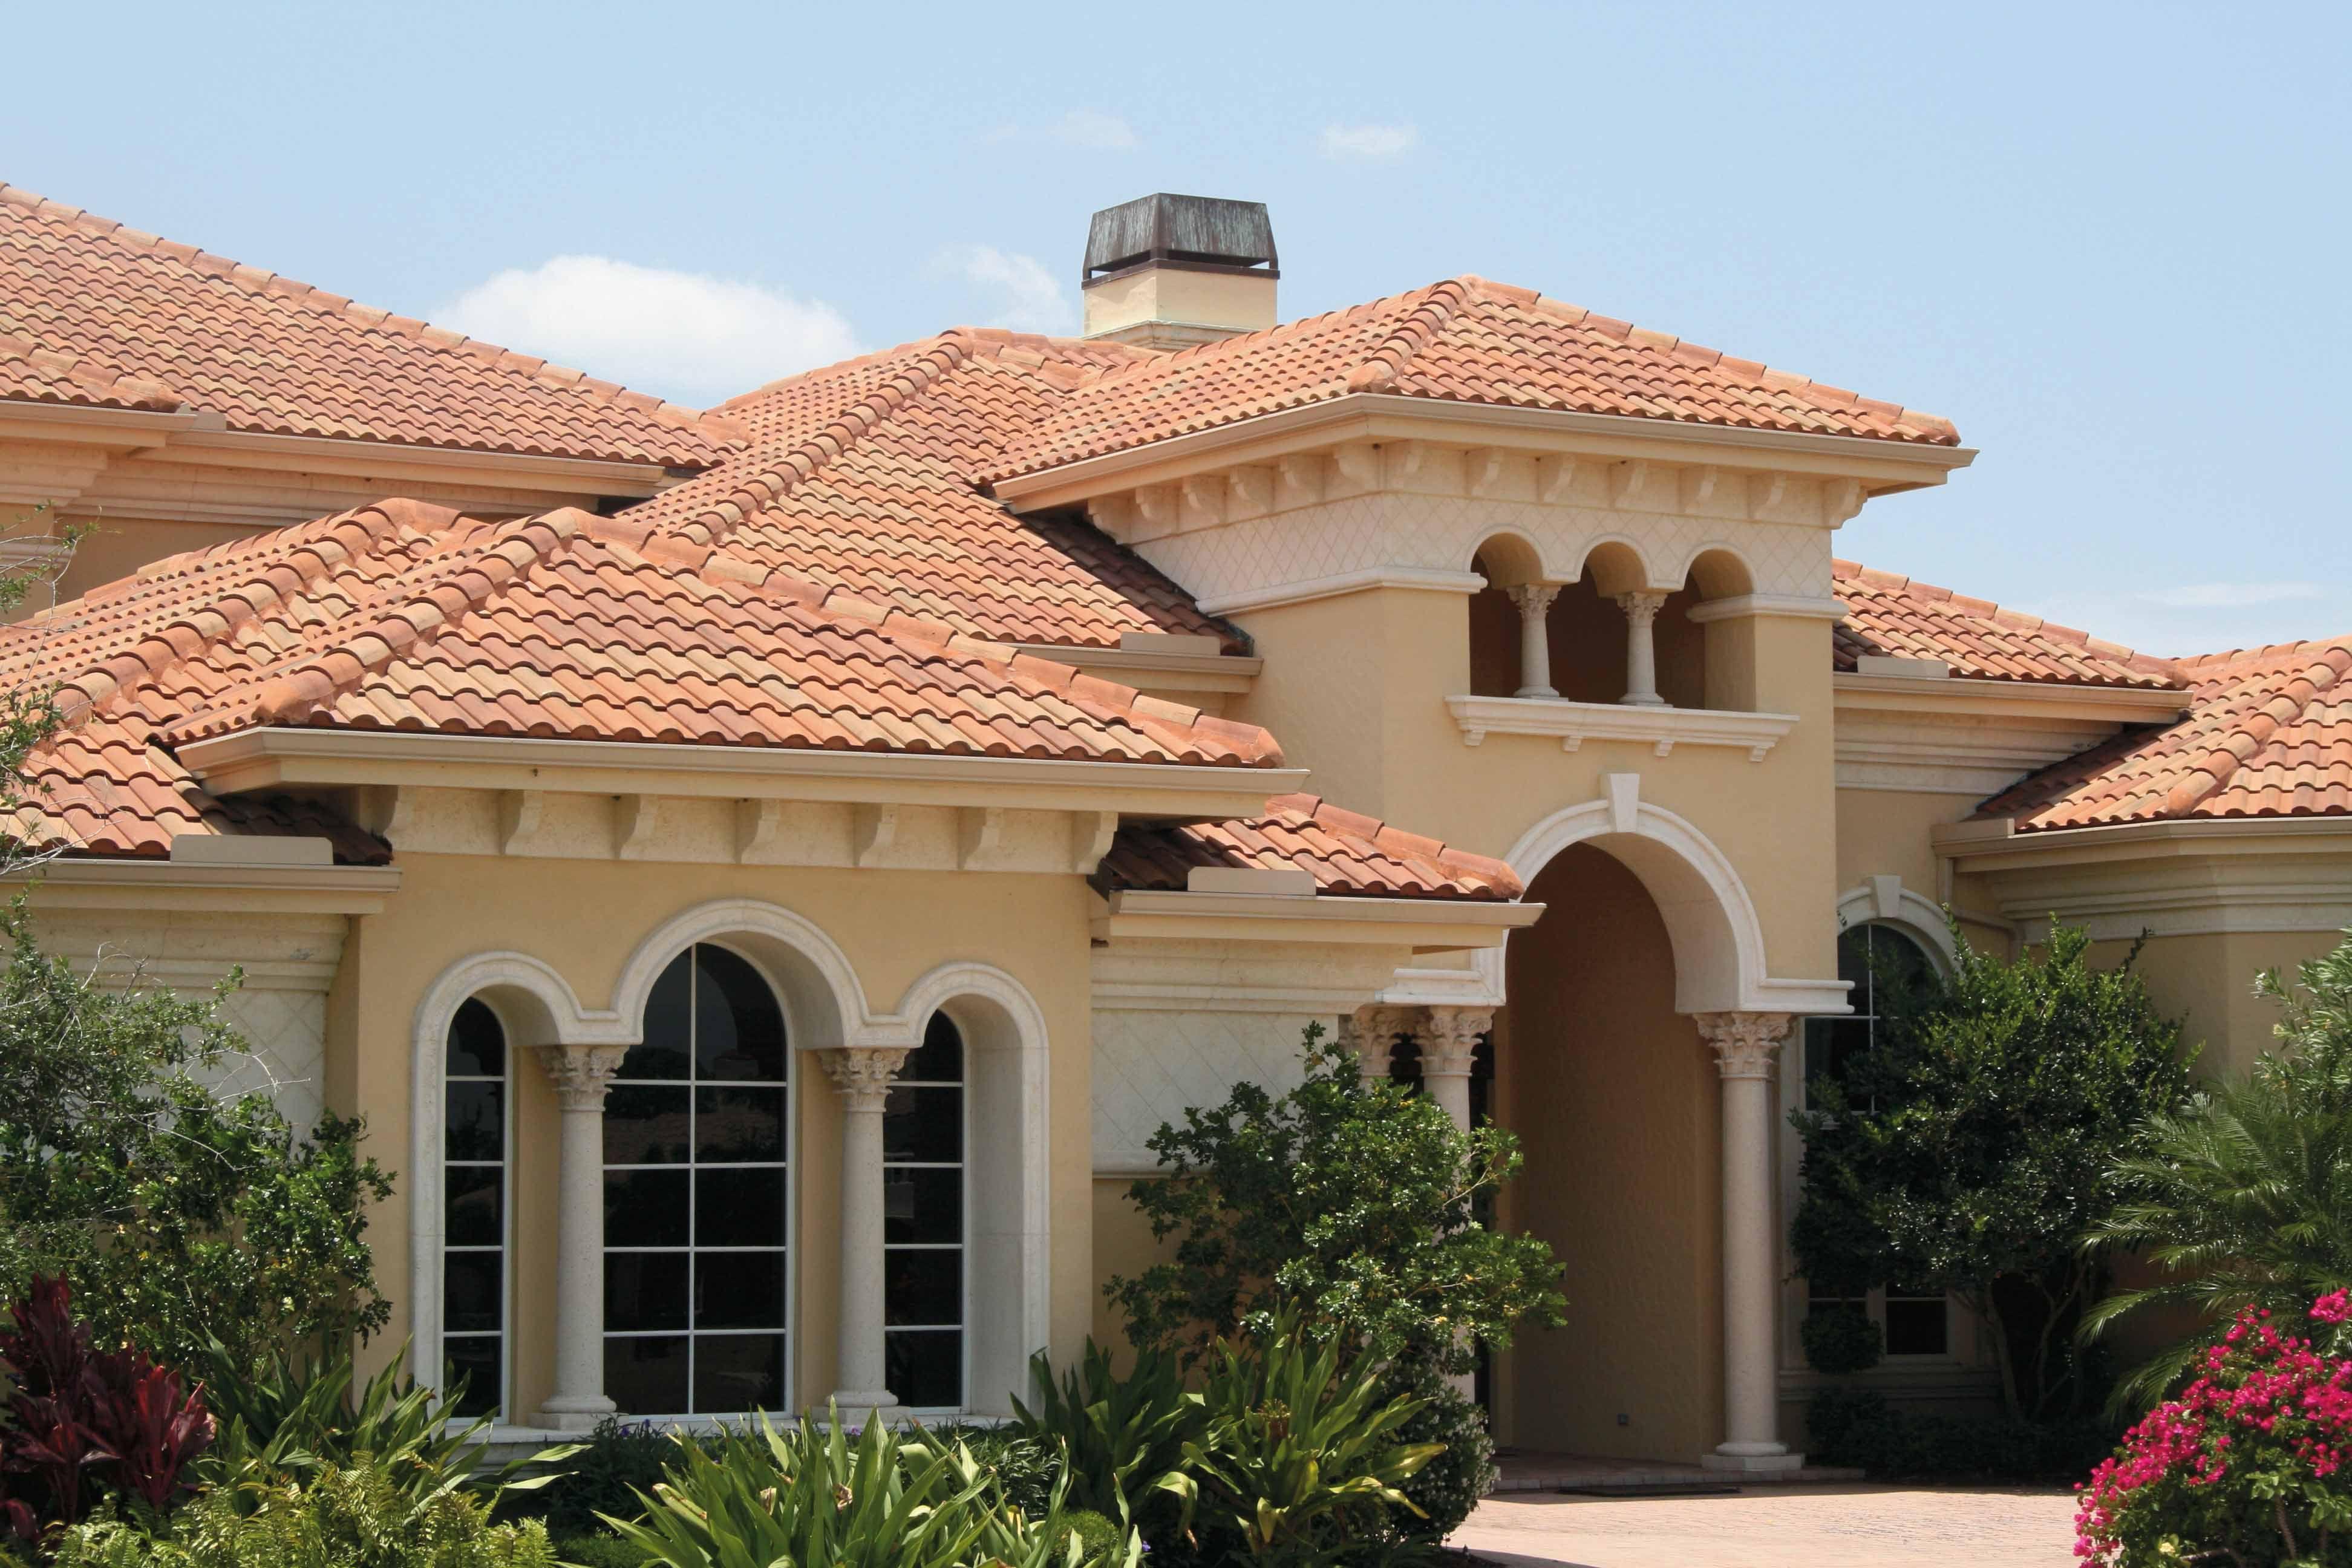 Mediterranean Style Spanish S Roof Tile  Dream House